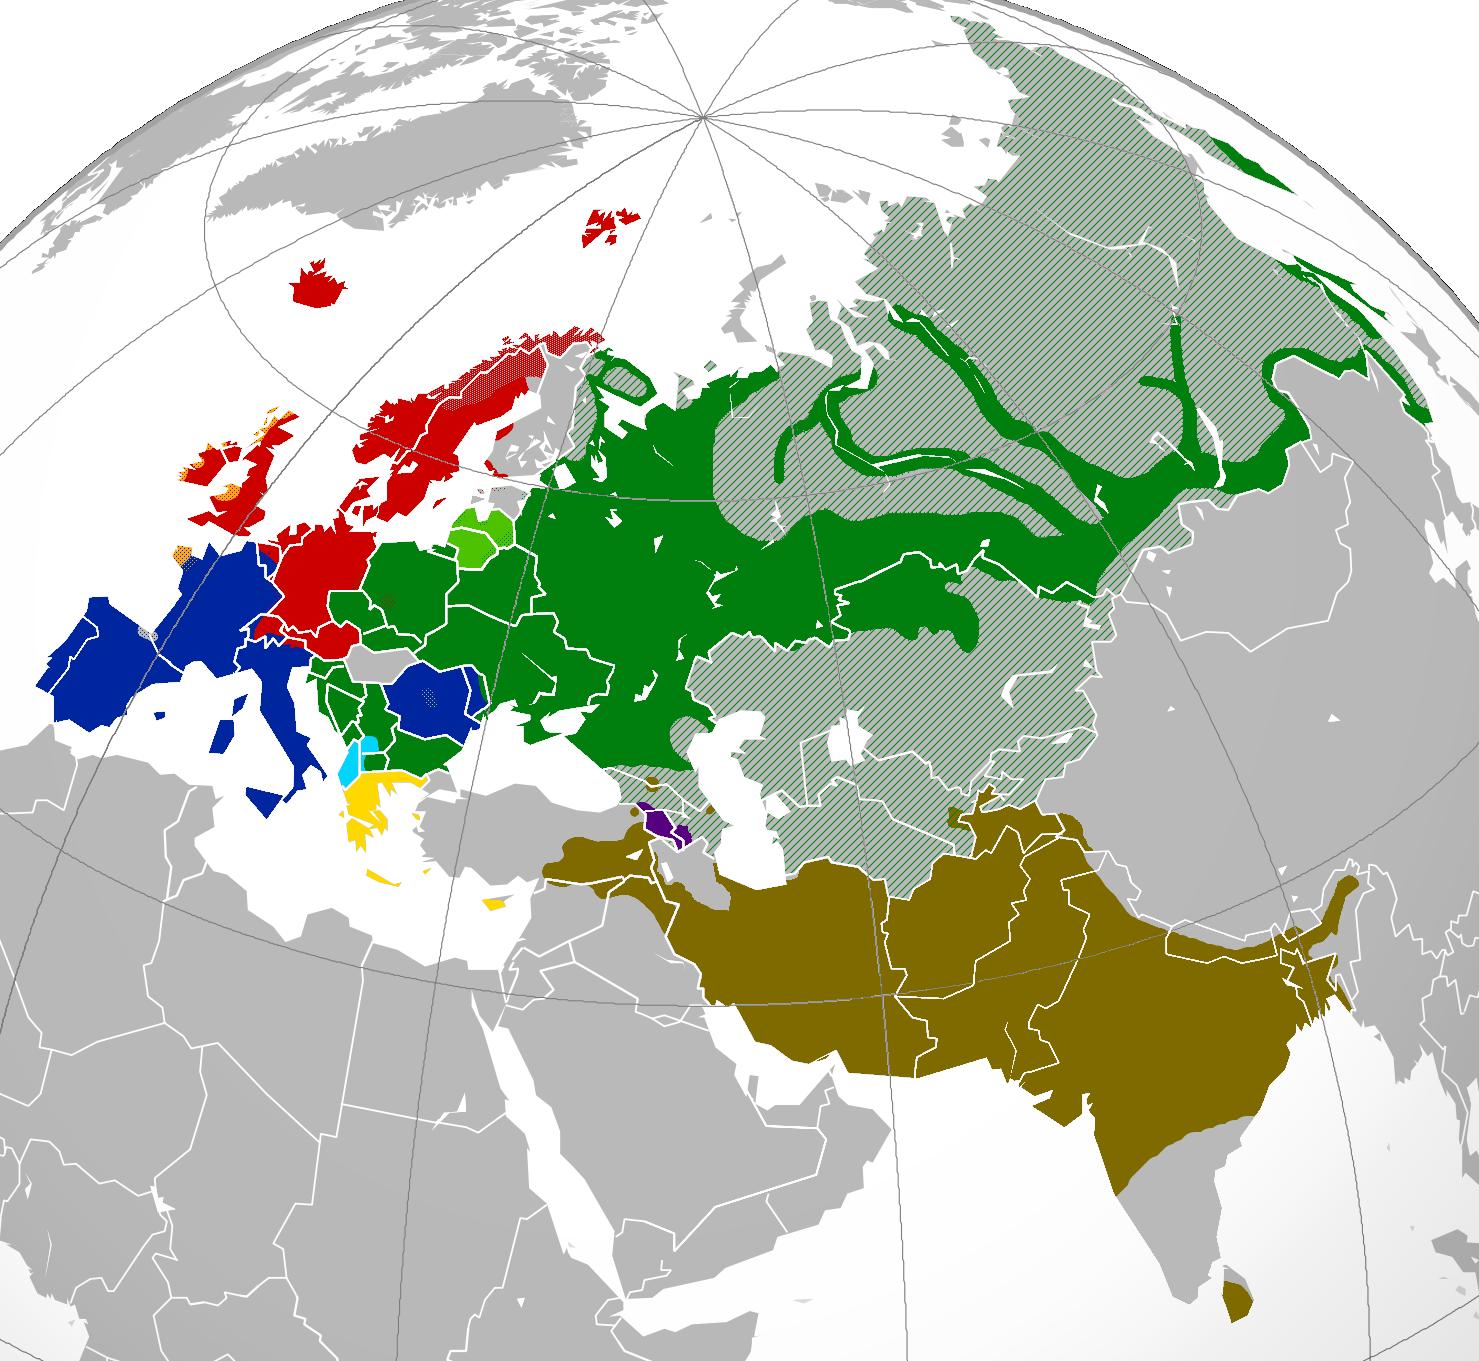 Present-day distribution of Indo-European language families across Eurasia #map #languages